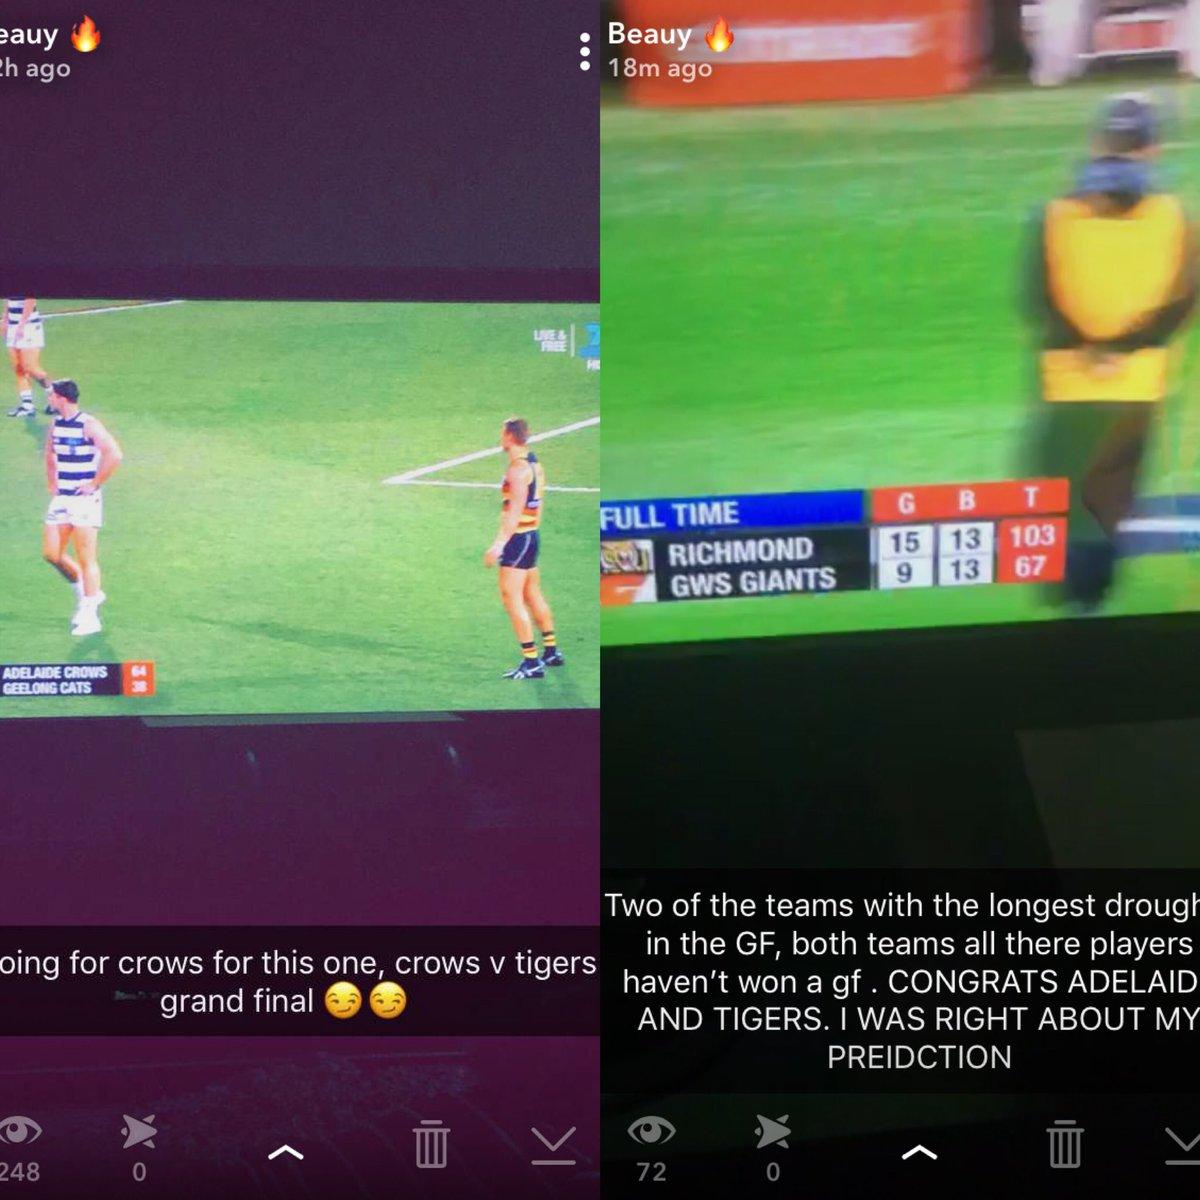 Was right about my prediction, Crows v Tigers Grand Final  #Predictor #AFL #AFLGF  #AFLFinals  #AFLCrowsCats #AFLTigerGiants<br>http://pic.twitter.com/OlkGX5VDsa